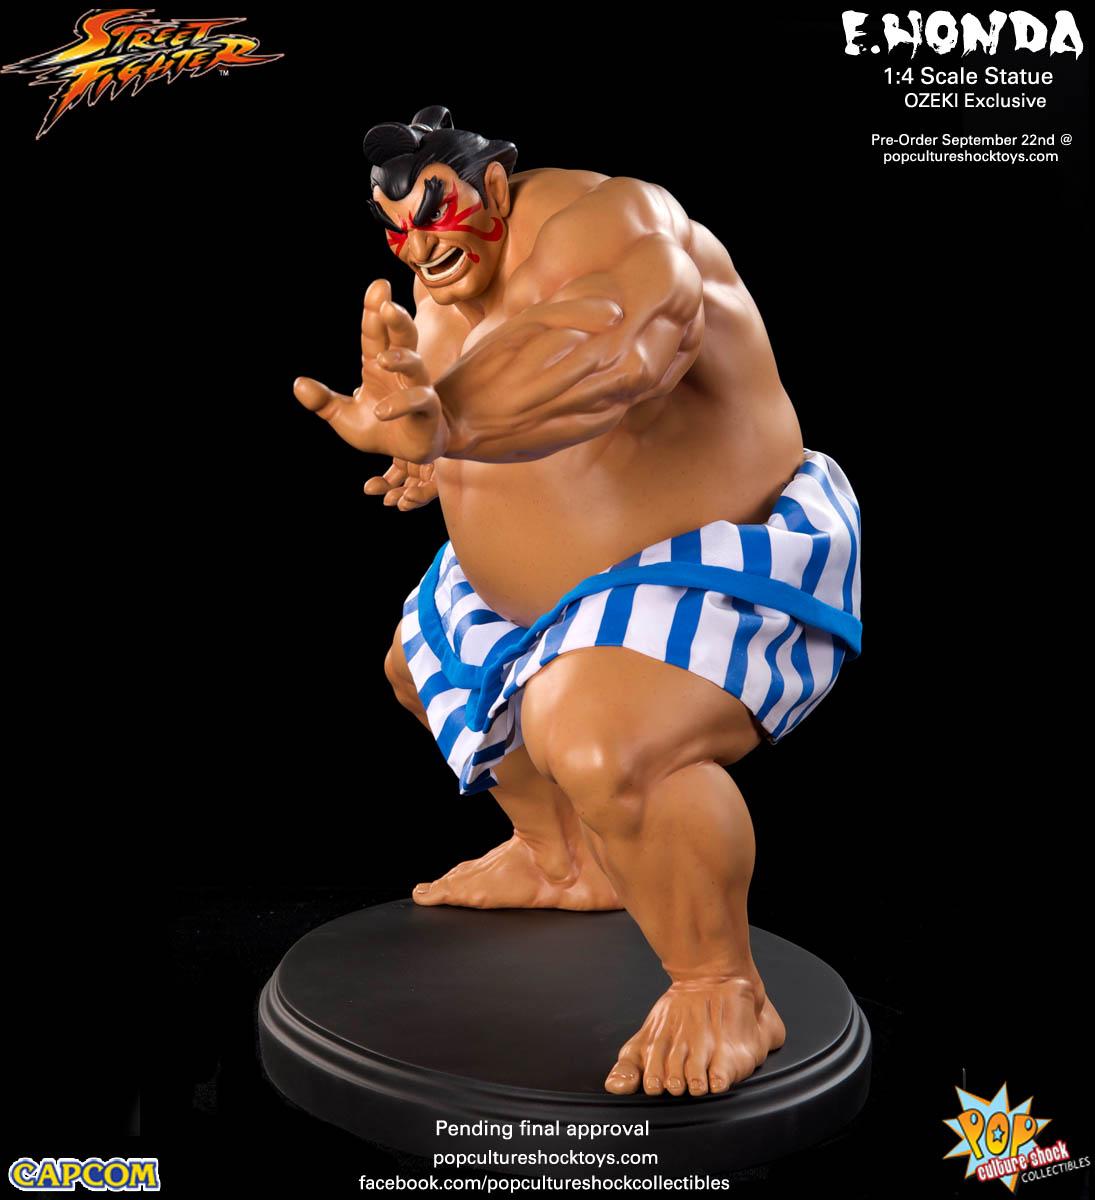 [Pop Culture Shock] Street Fighter: E. Honda 1/4 Statue - Página 3 Street-Fighter-E.-Honda-ozeki-Statue-008